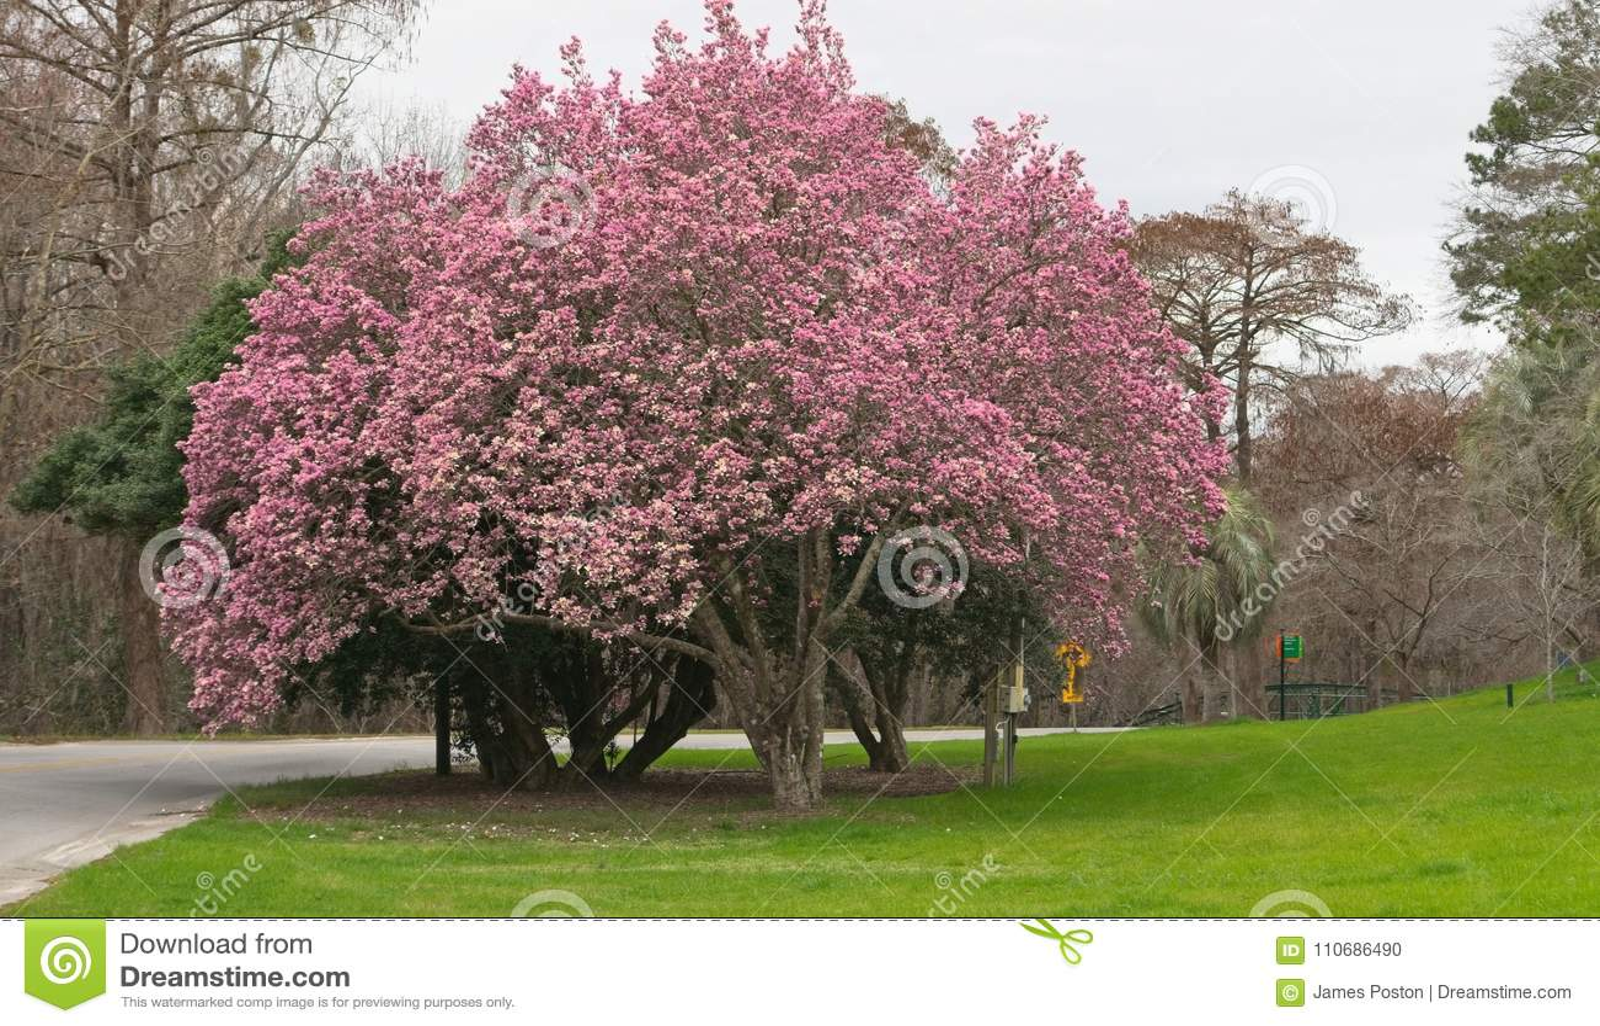 Tulip Tree In Full Bloom Stock Photo Image Of Bloom 110686490